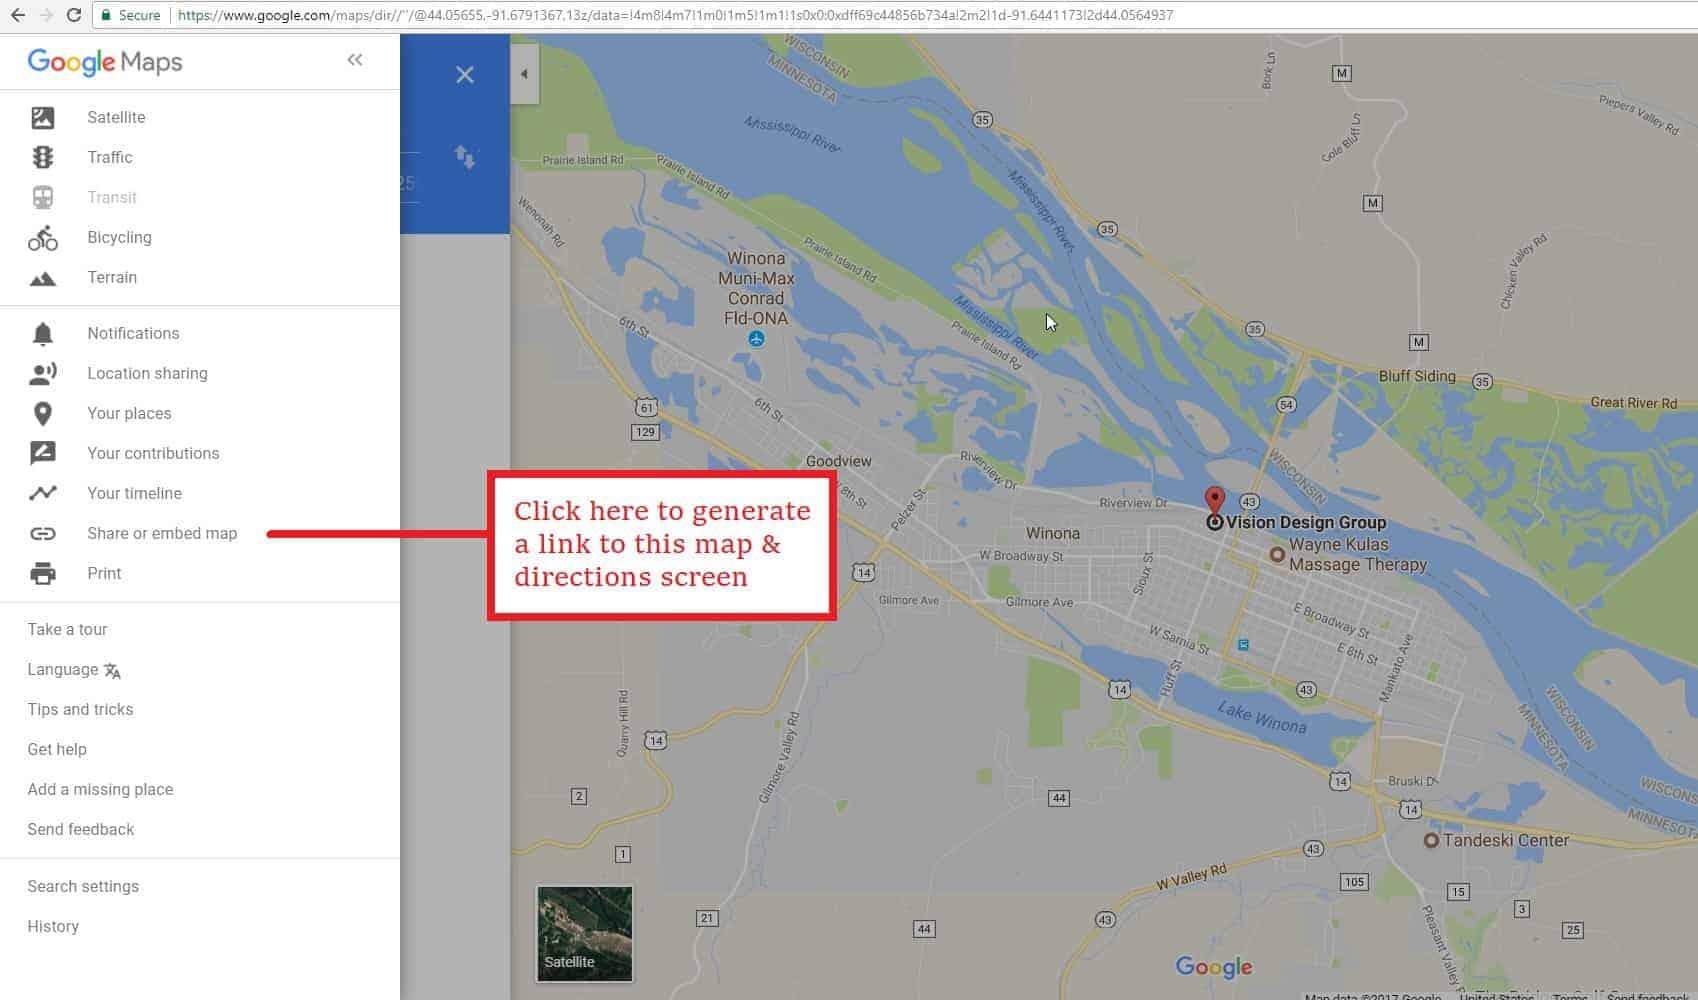 Google Maps - 3a